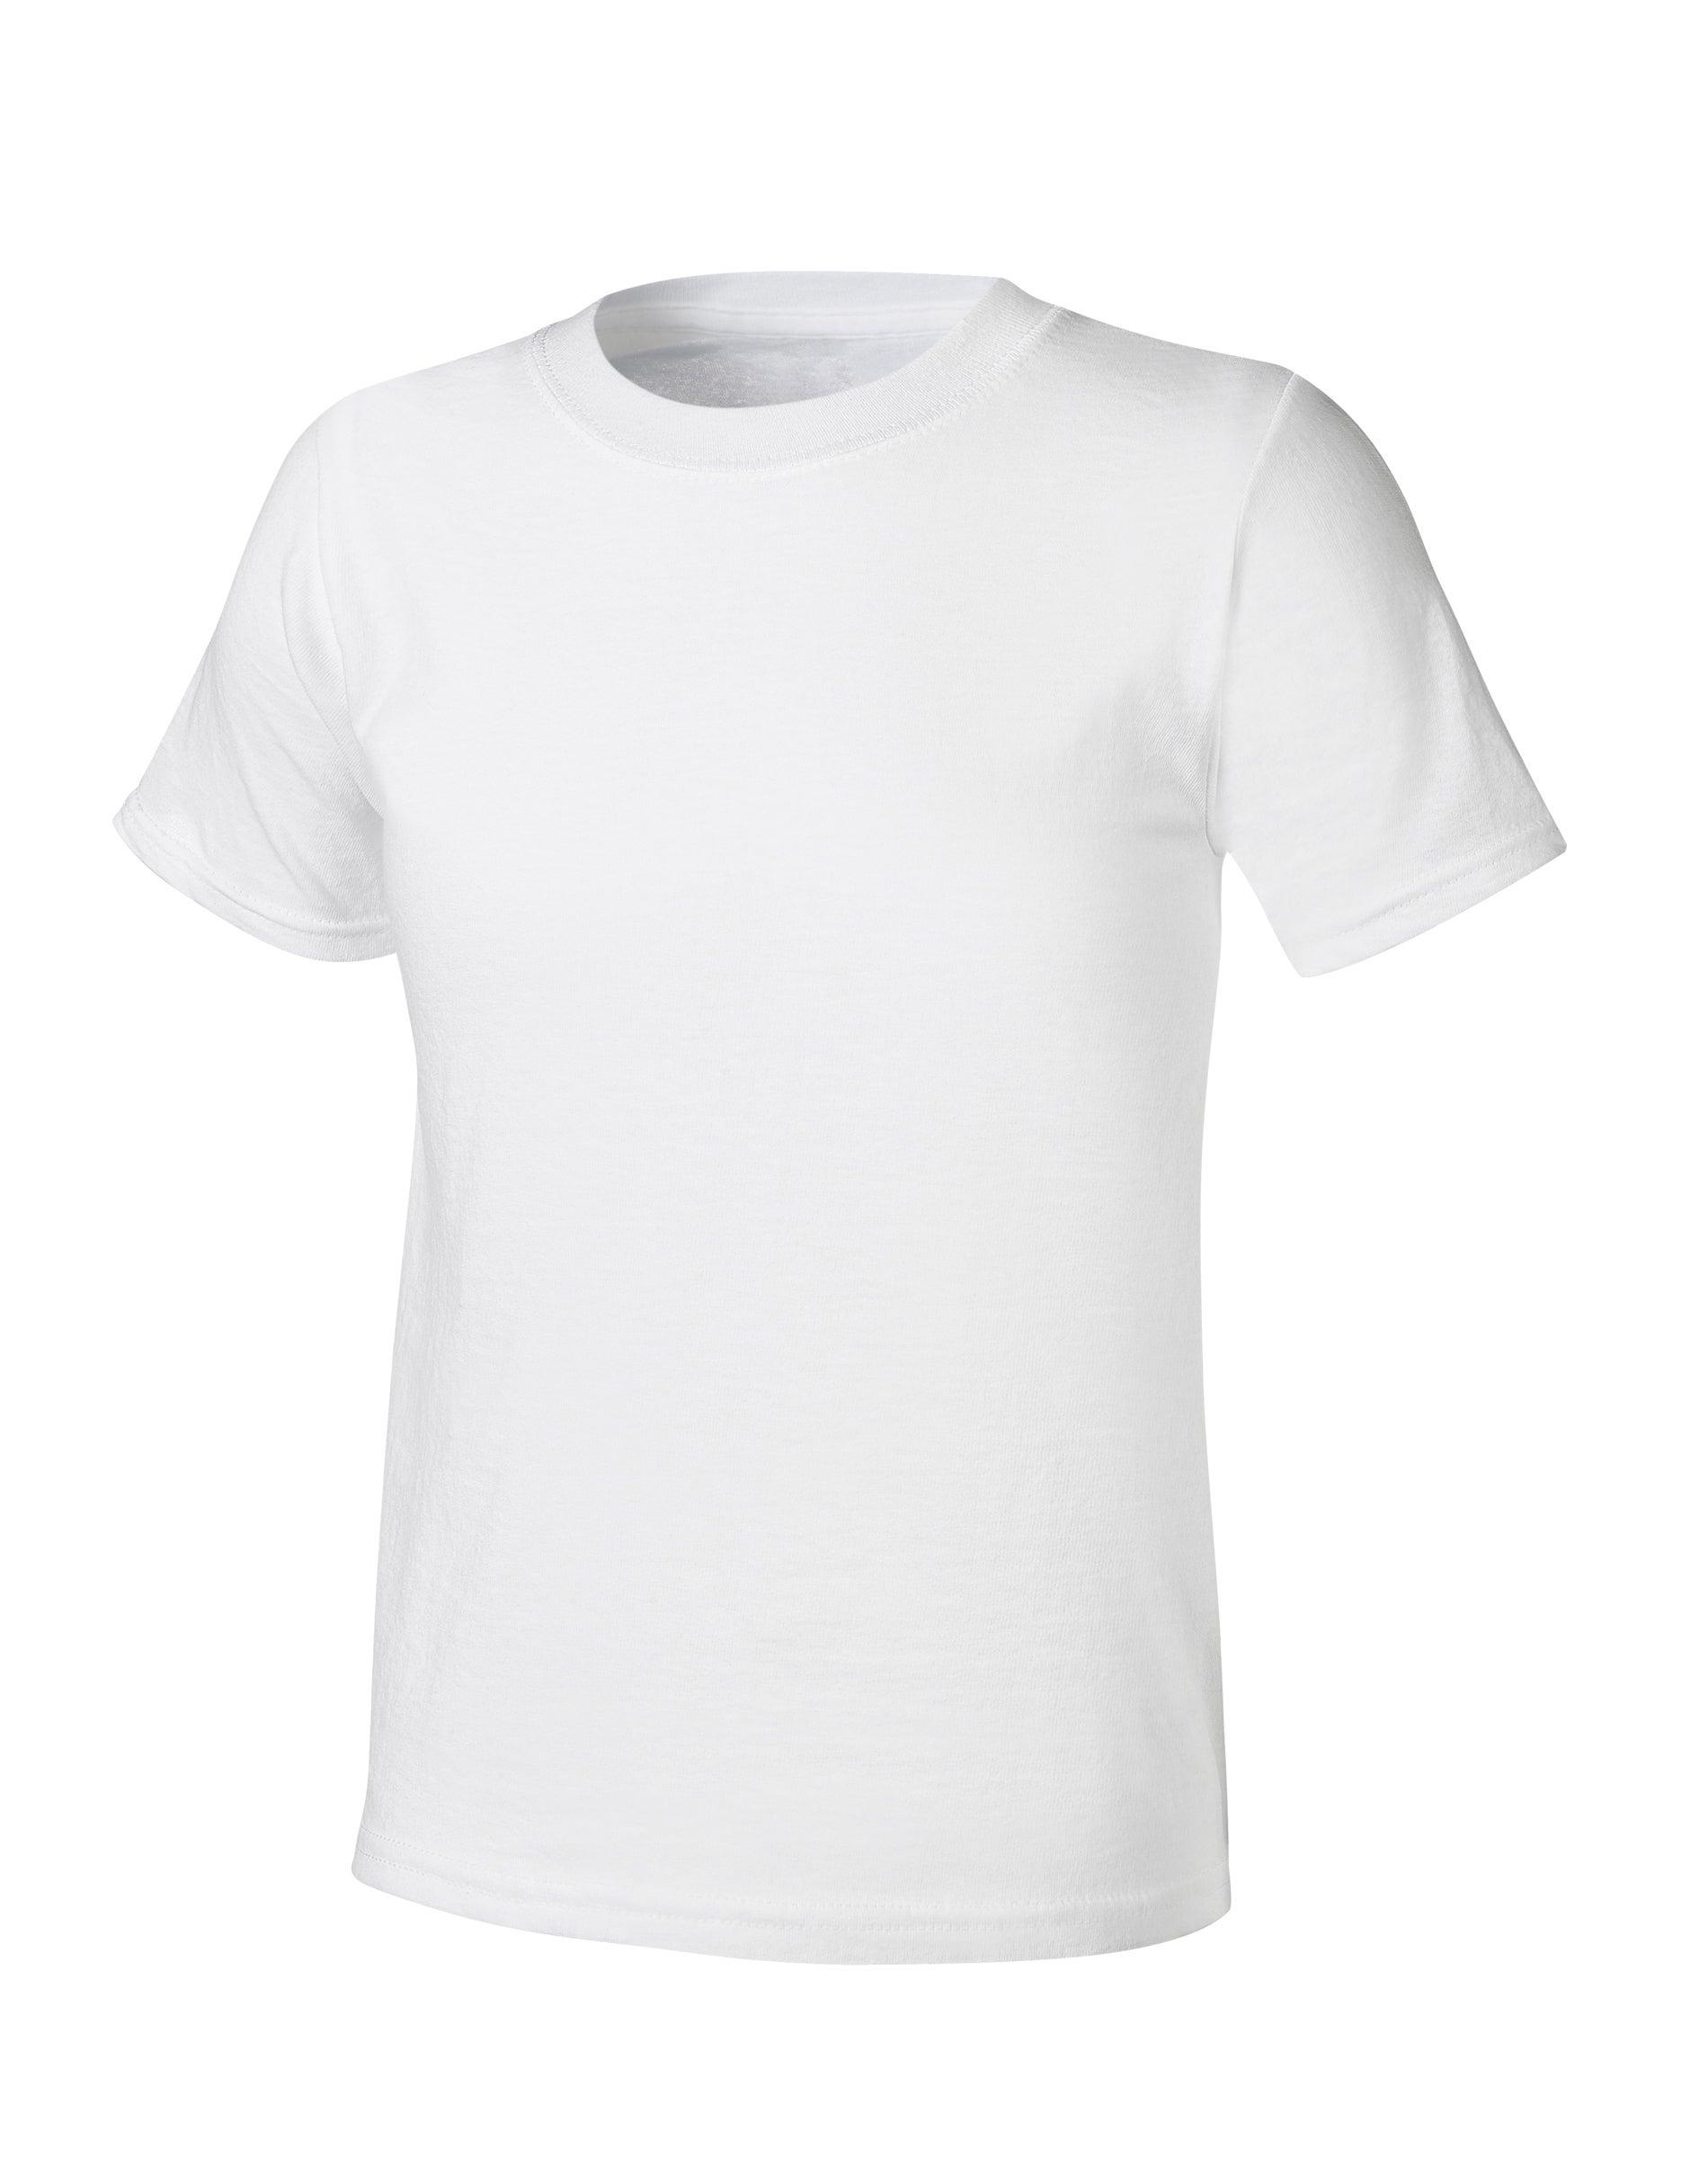 Multipack B-One Kids Boys Cotton Tank Top Undershirt